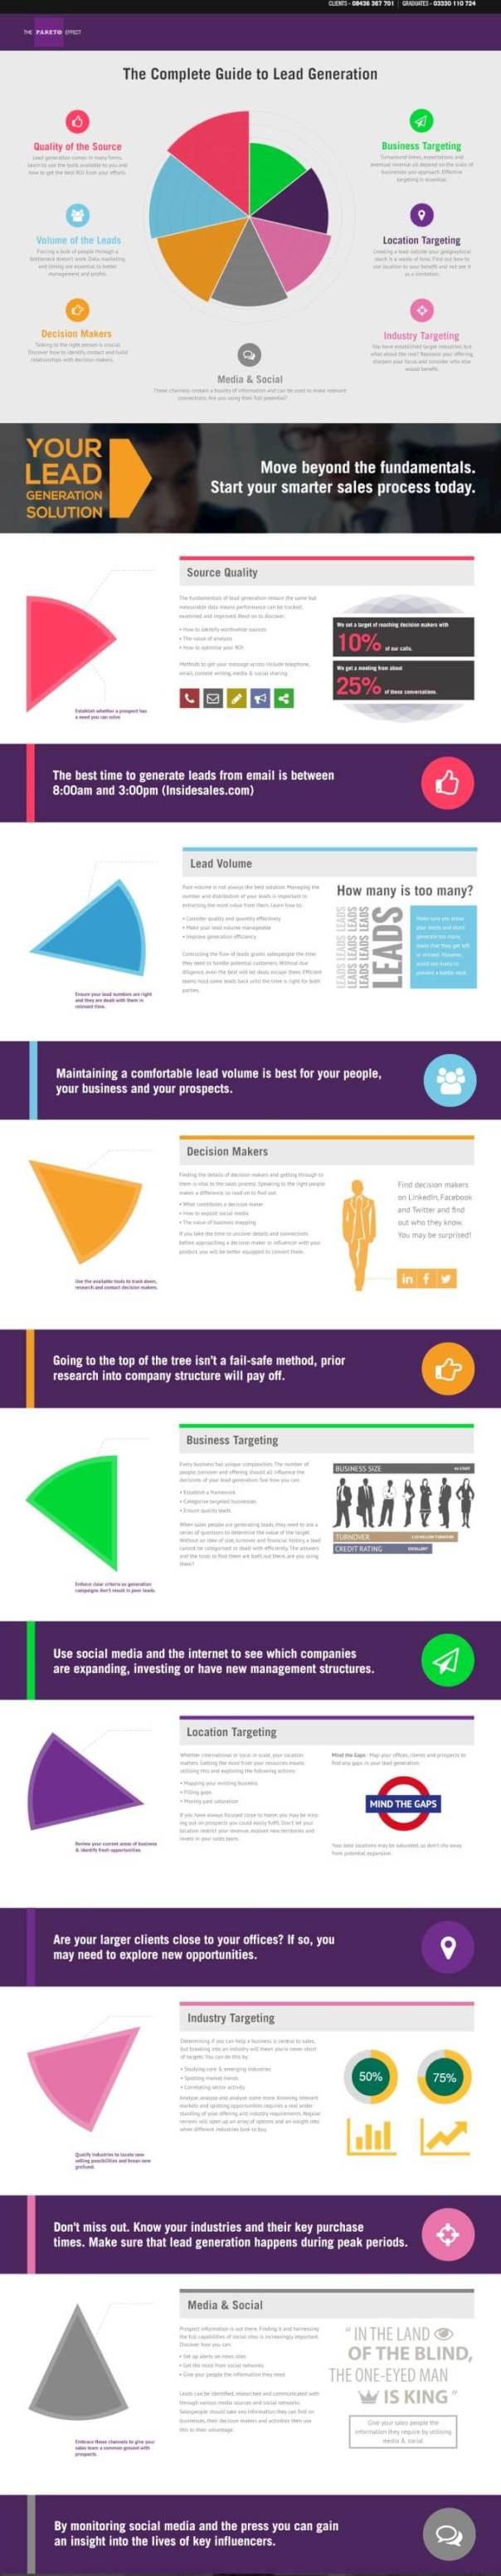 seven_vital_components_of_lead_generation